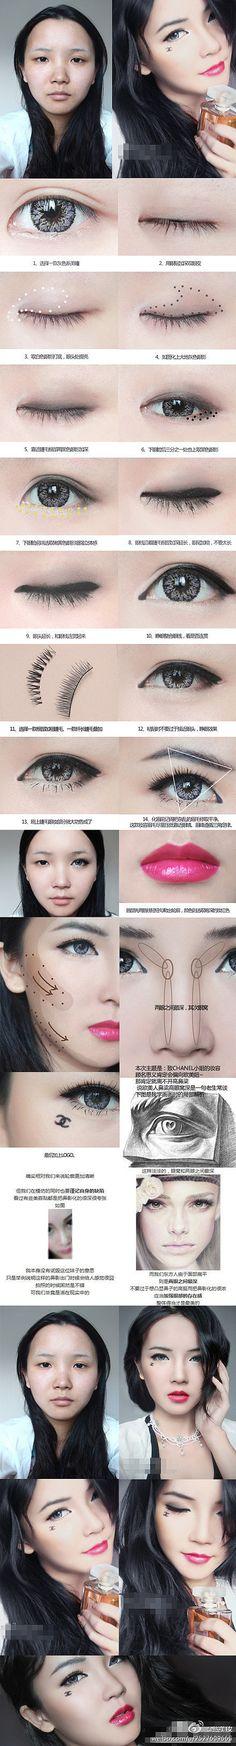 Maquillaje                                                       …